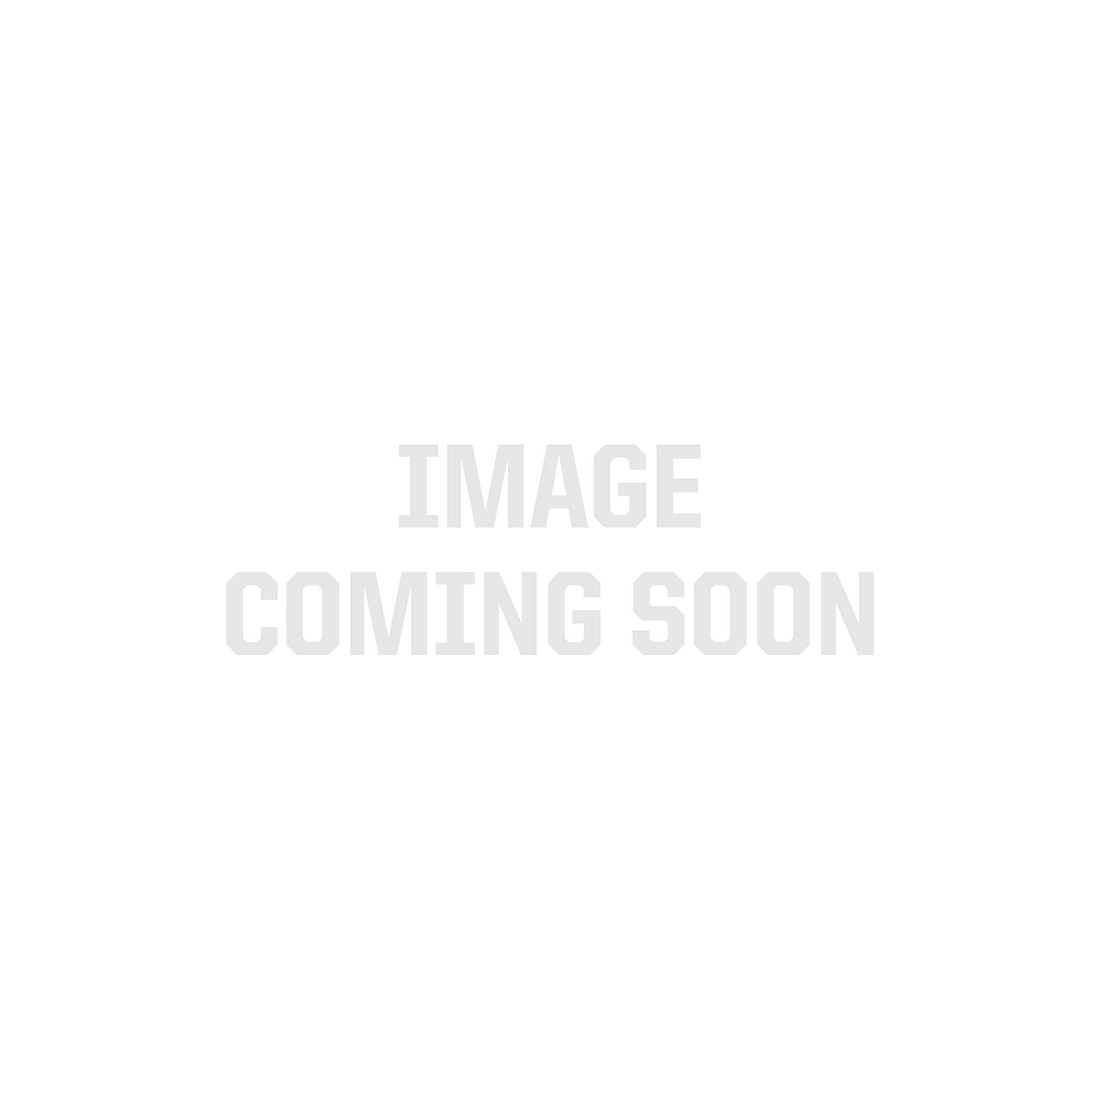 TruColor 2835 CurrentControl LED Strip Light - 2,700K - 80/m - CurrentControl - 1 Foot